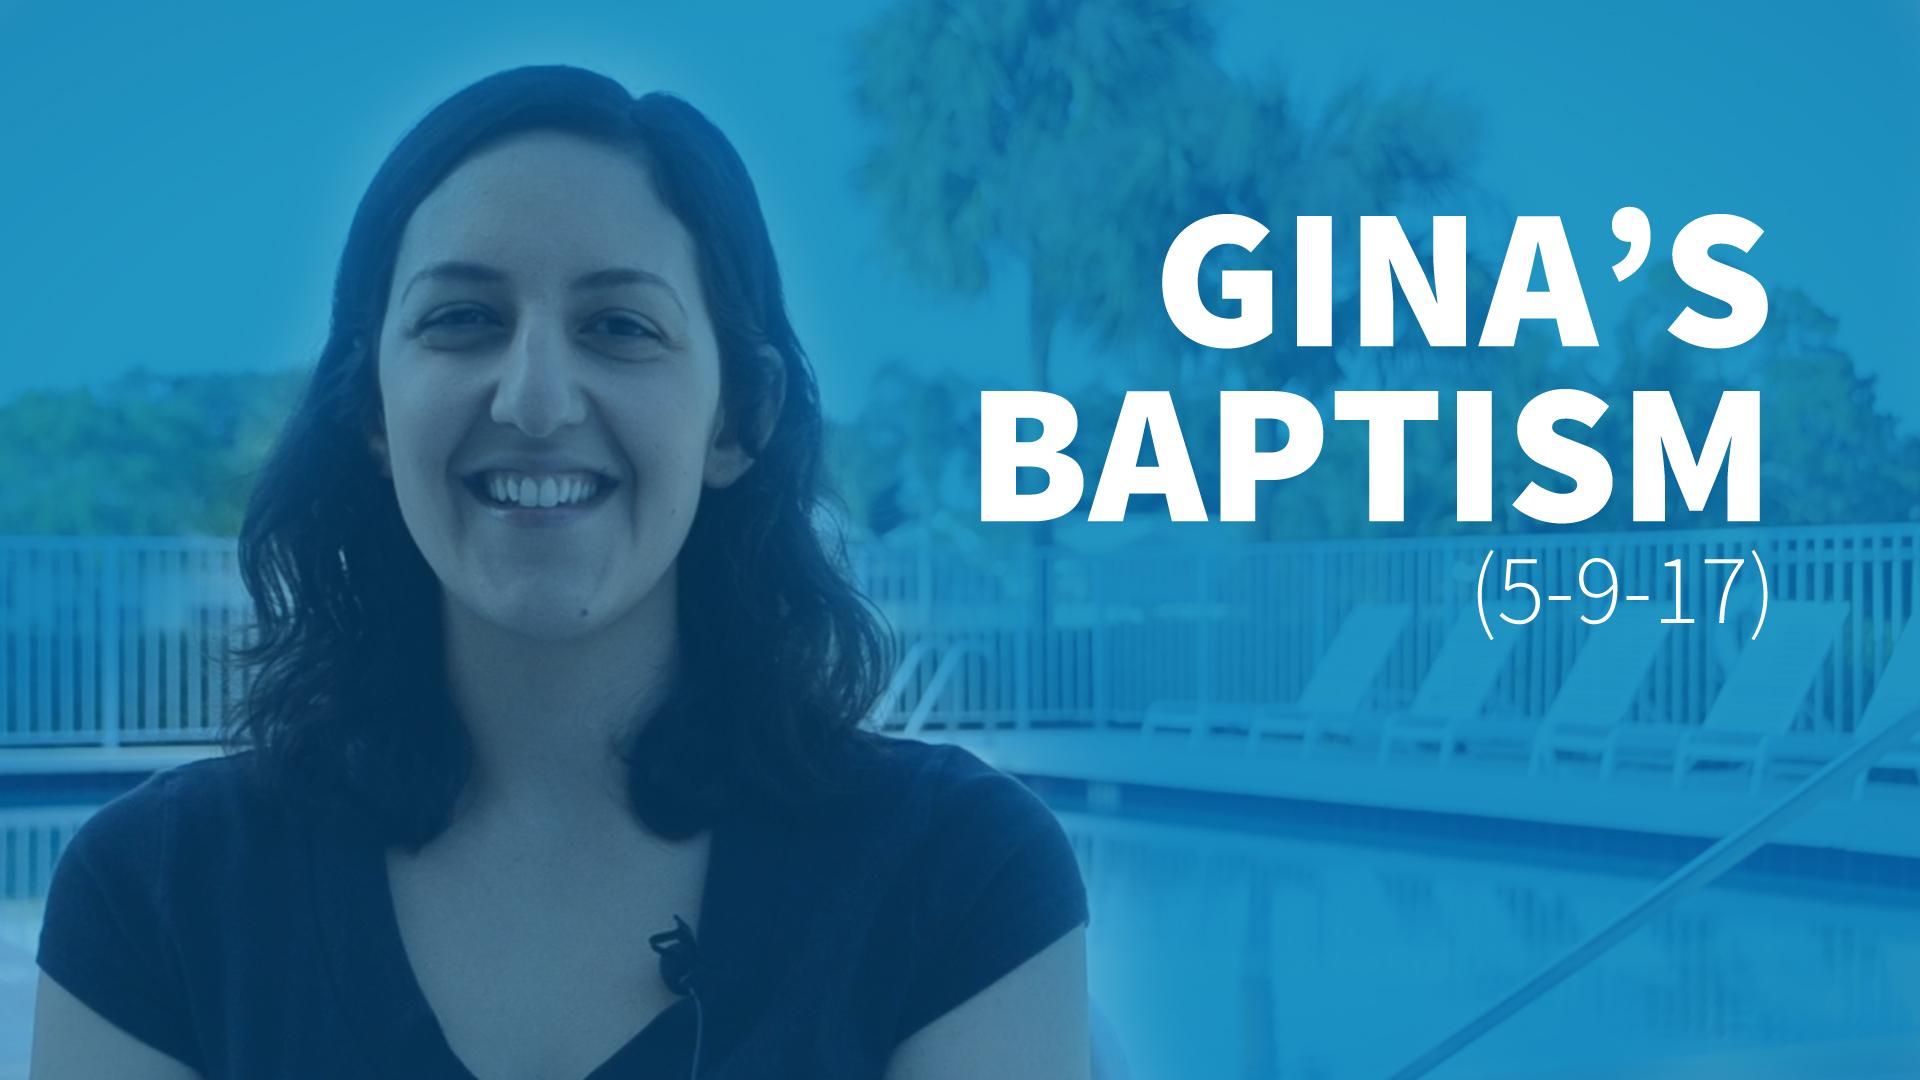 Gina baptism.jpg